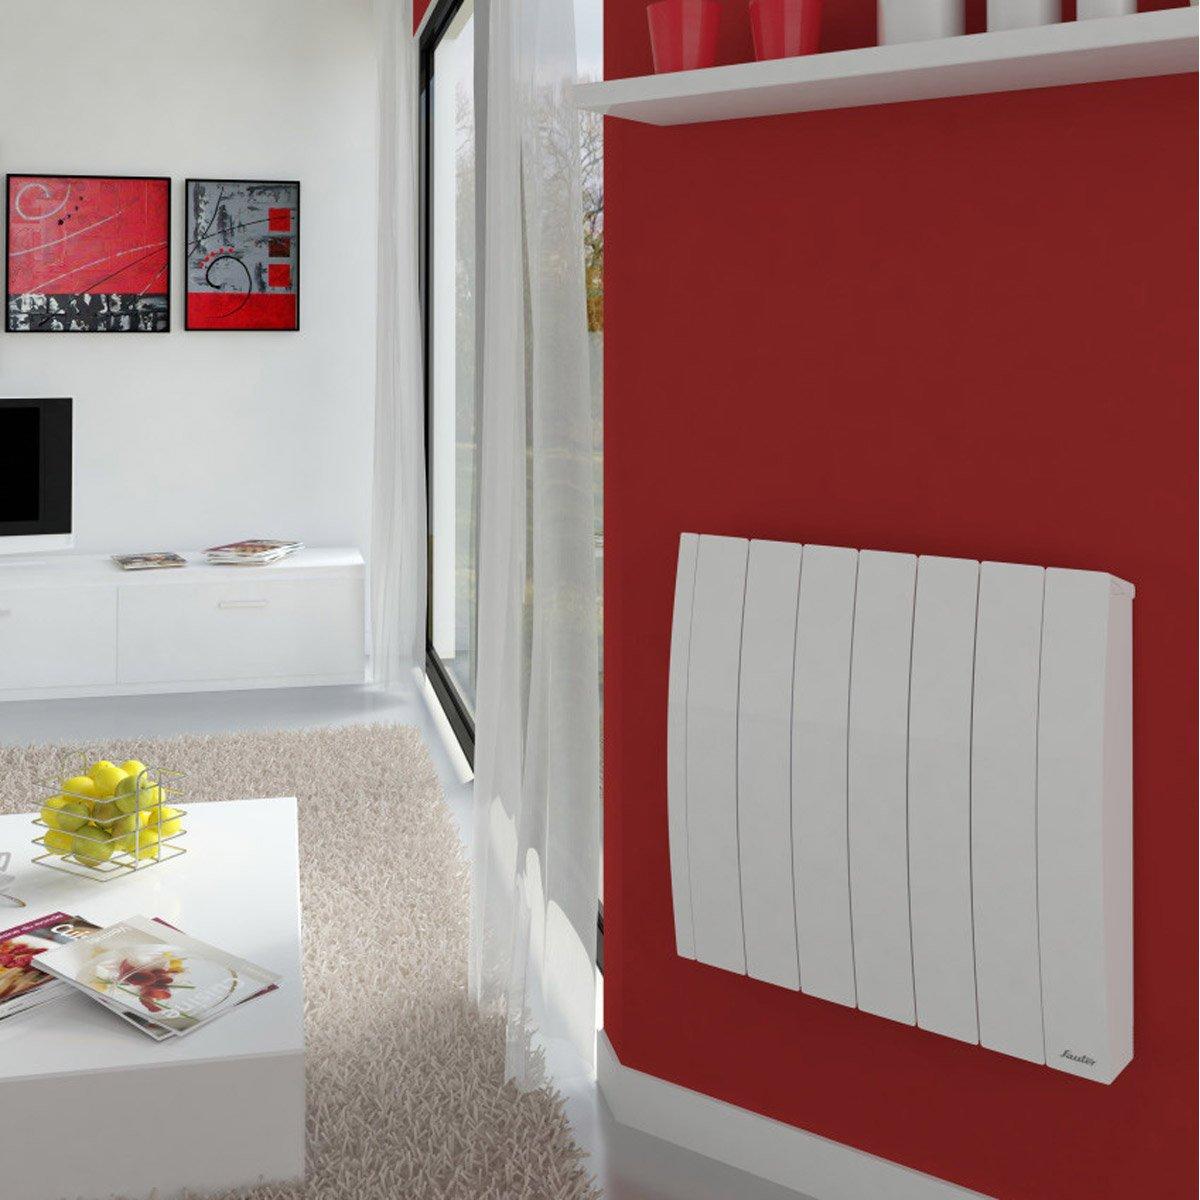 radiateur lectrique inertie fluide sauter bachata 2000 w leroy merlin. Black Bedroom Furniture Sets. Home Design Ideas